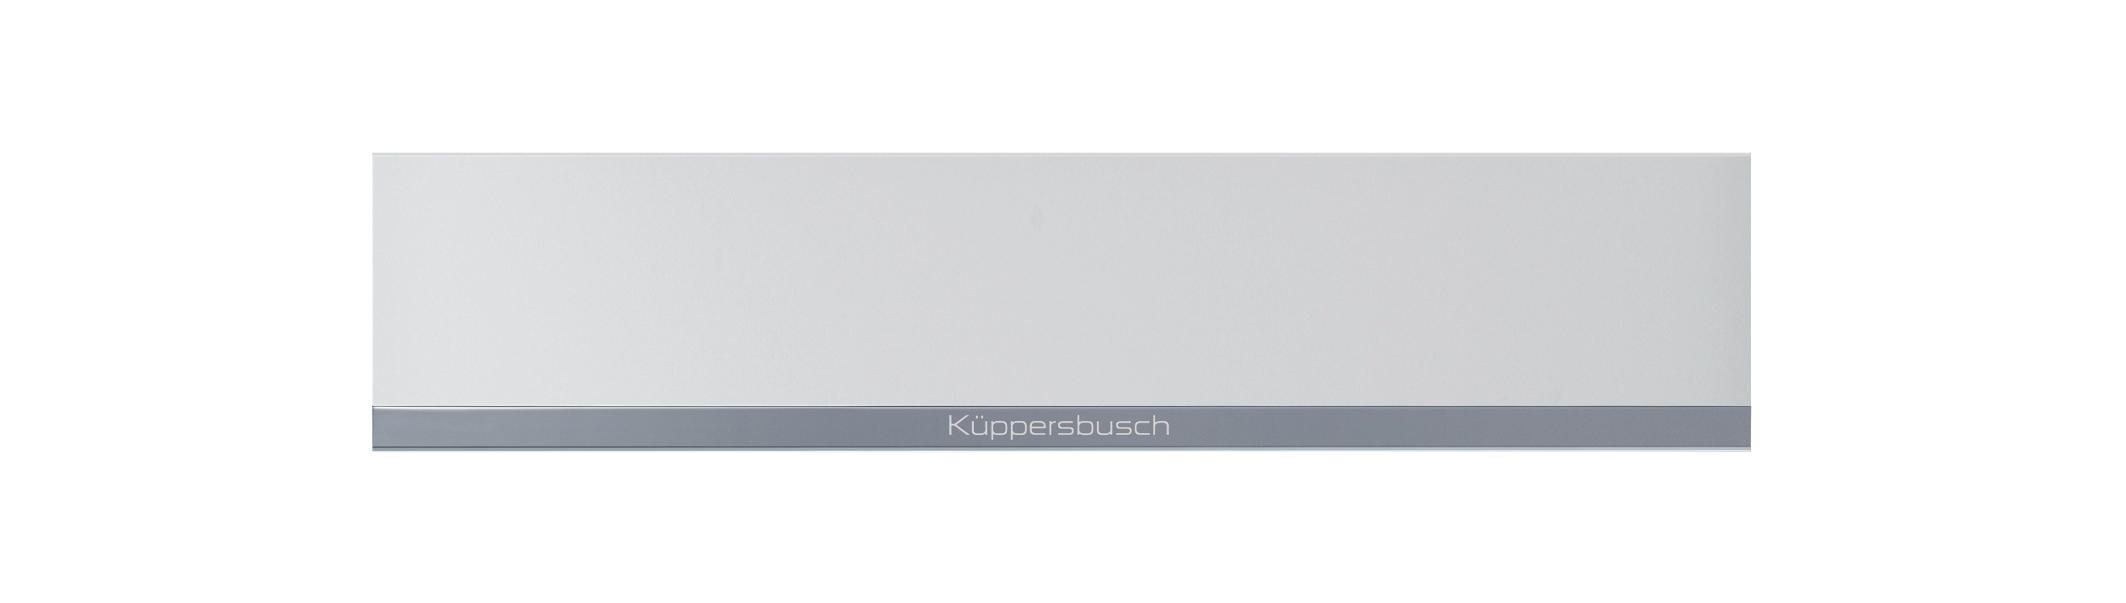 CSV 6800.0 + DK 1002